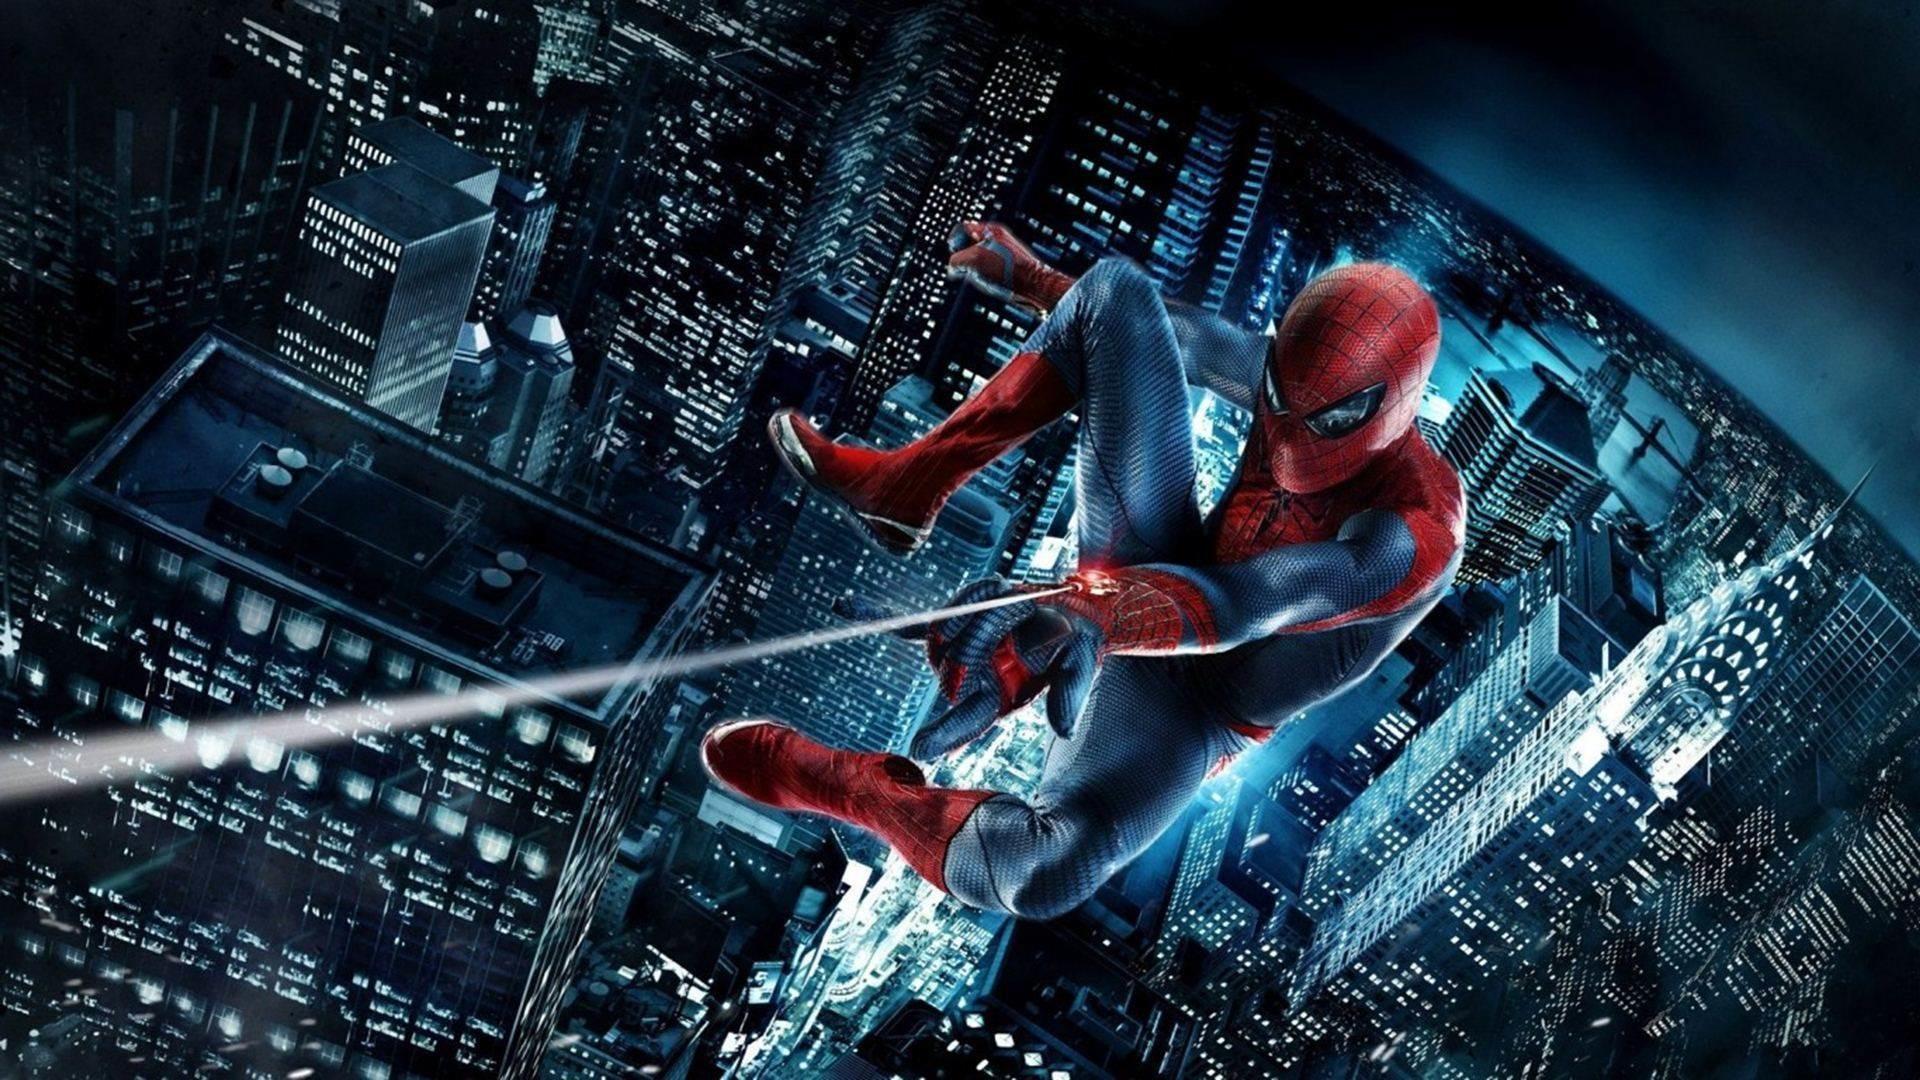 The Amazing SpiderMan HD desktop wallpaper : High 1024×768 The Amazing  Spiderman 2 Wallpapers